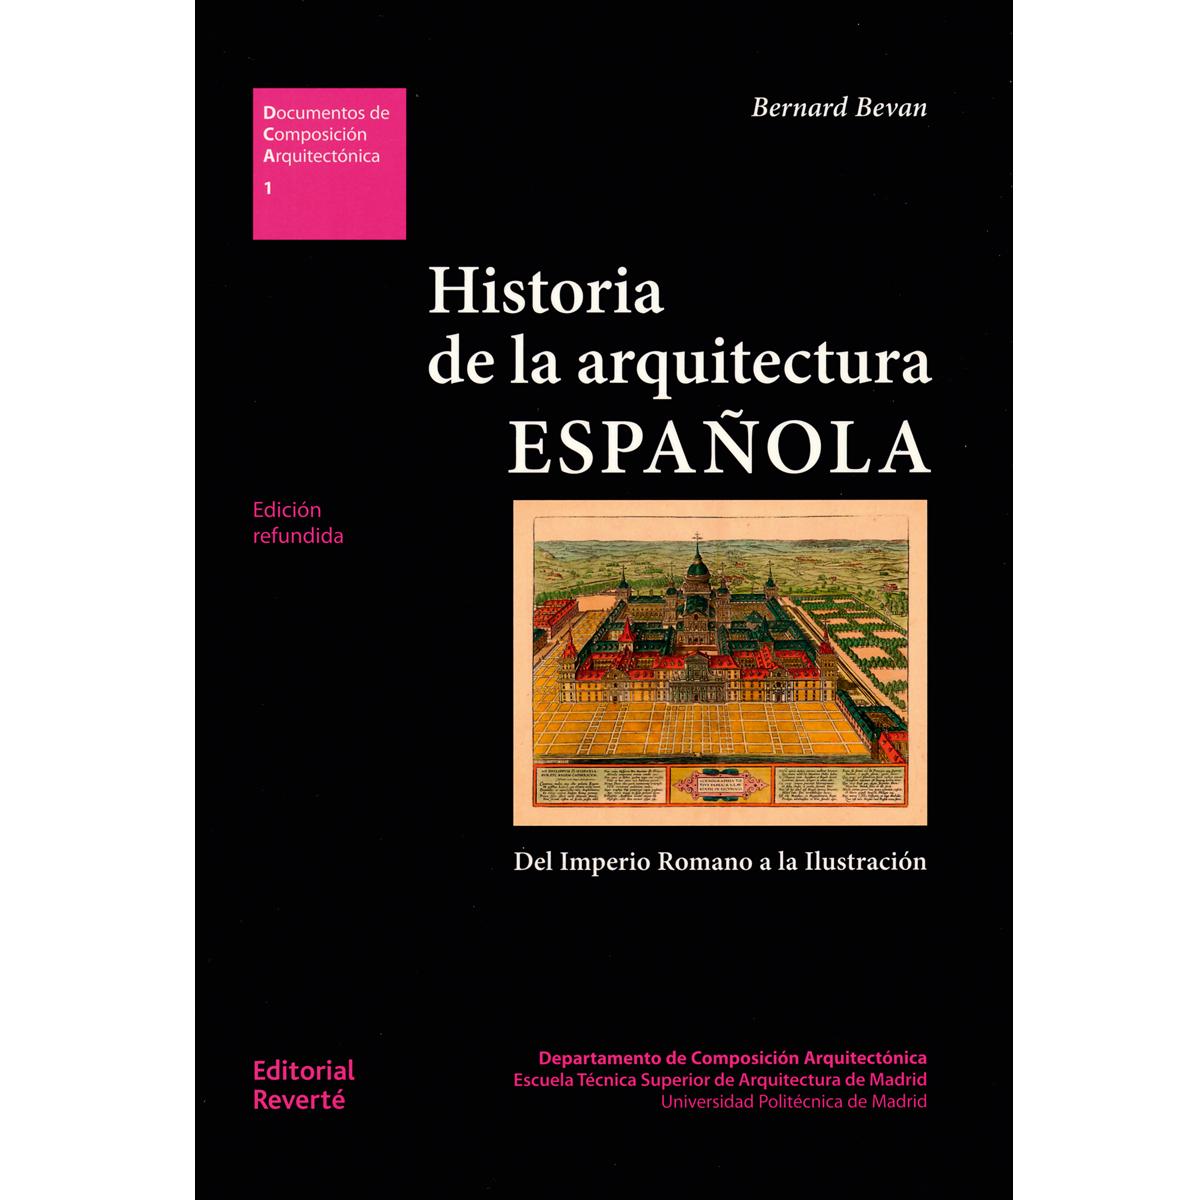 Historia de la arquitectura española